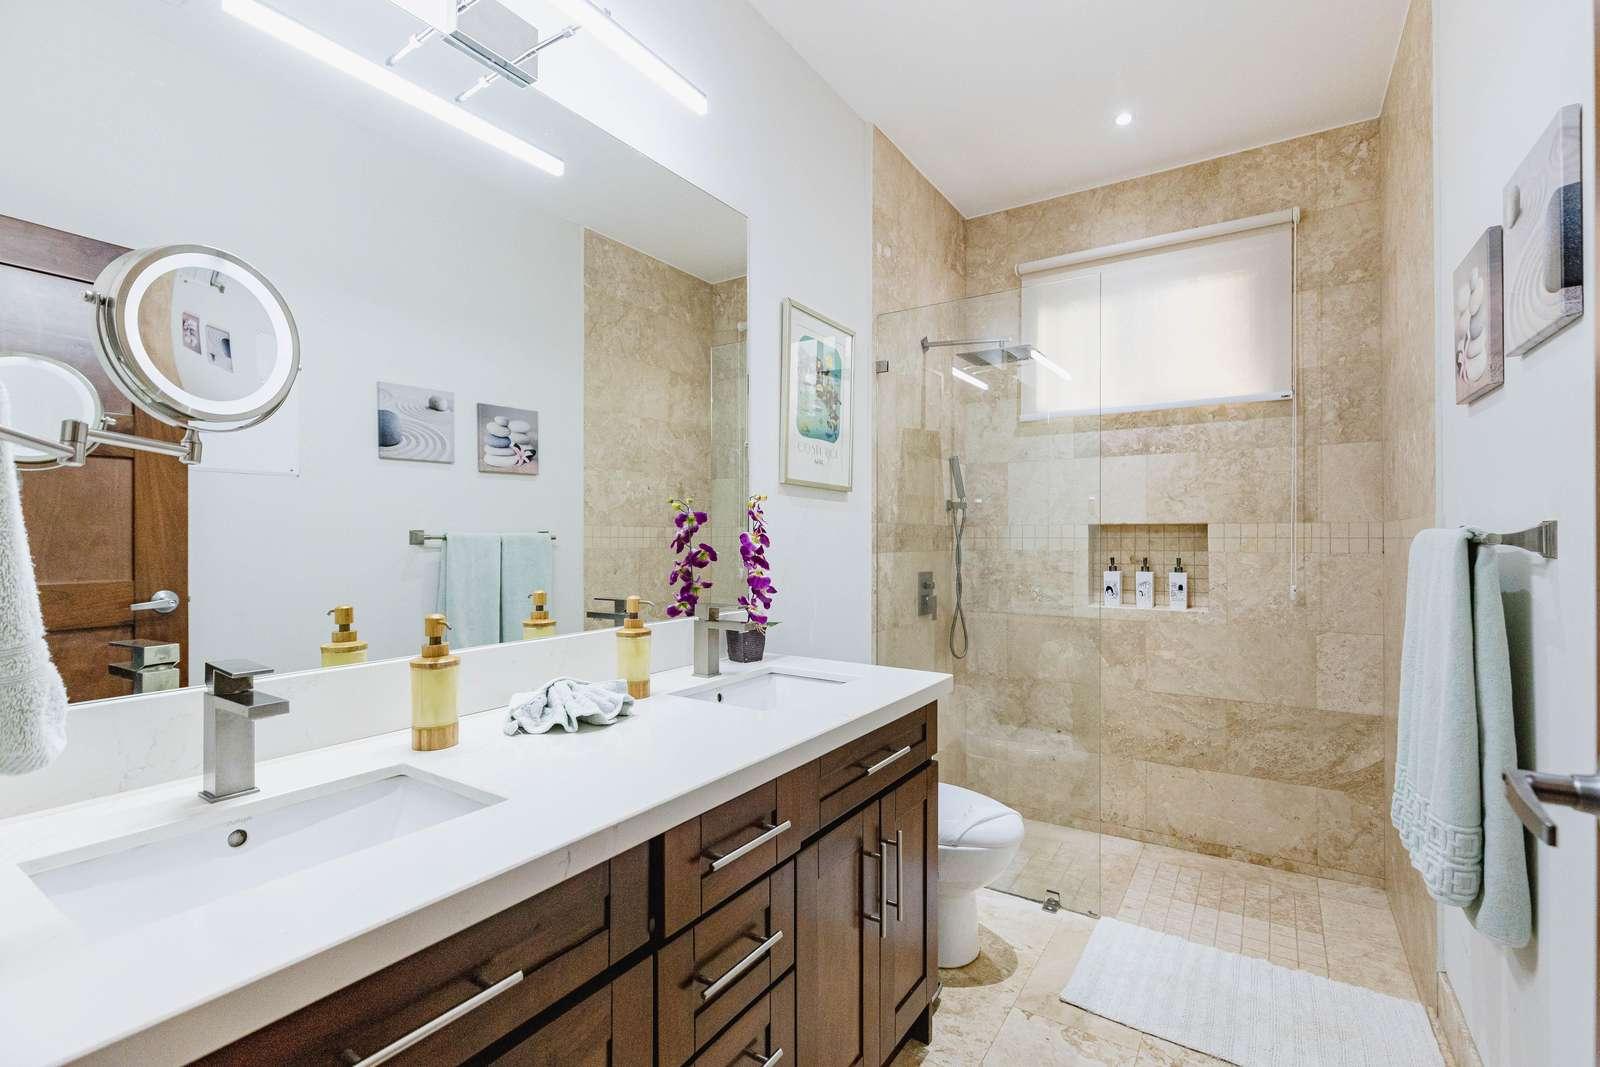 Full private bathroom, dual vanity, quartz countertops, walk in shower, travertine flooring